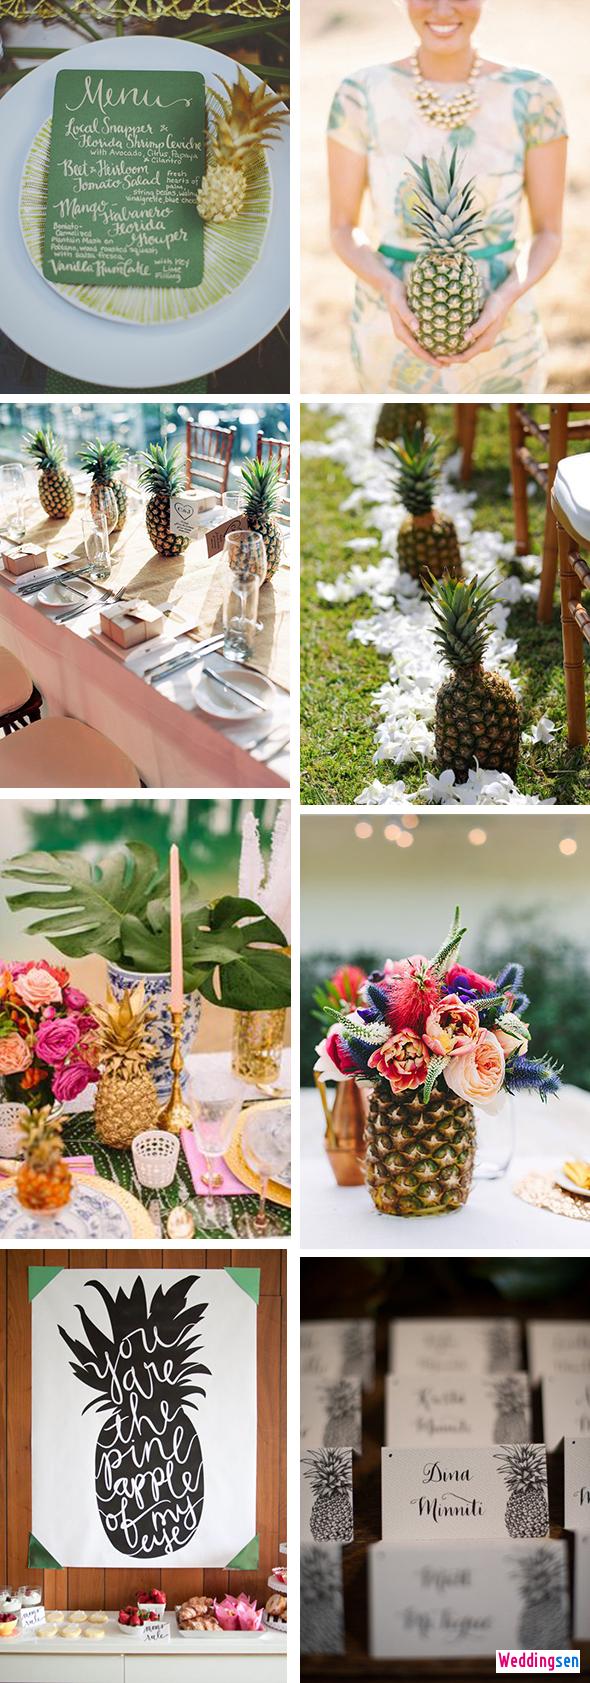 Pin by eva herman on wedding uc pinterest dress ideas wedding